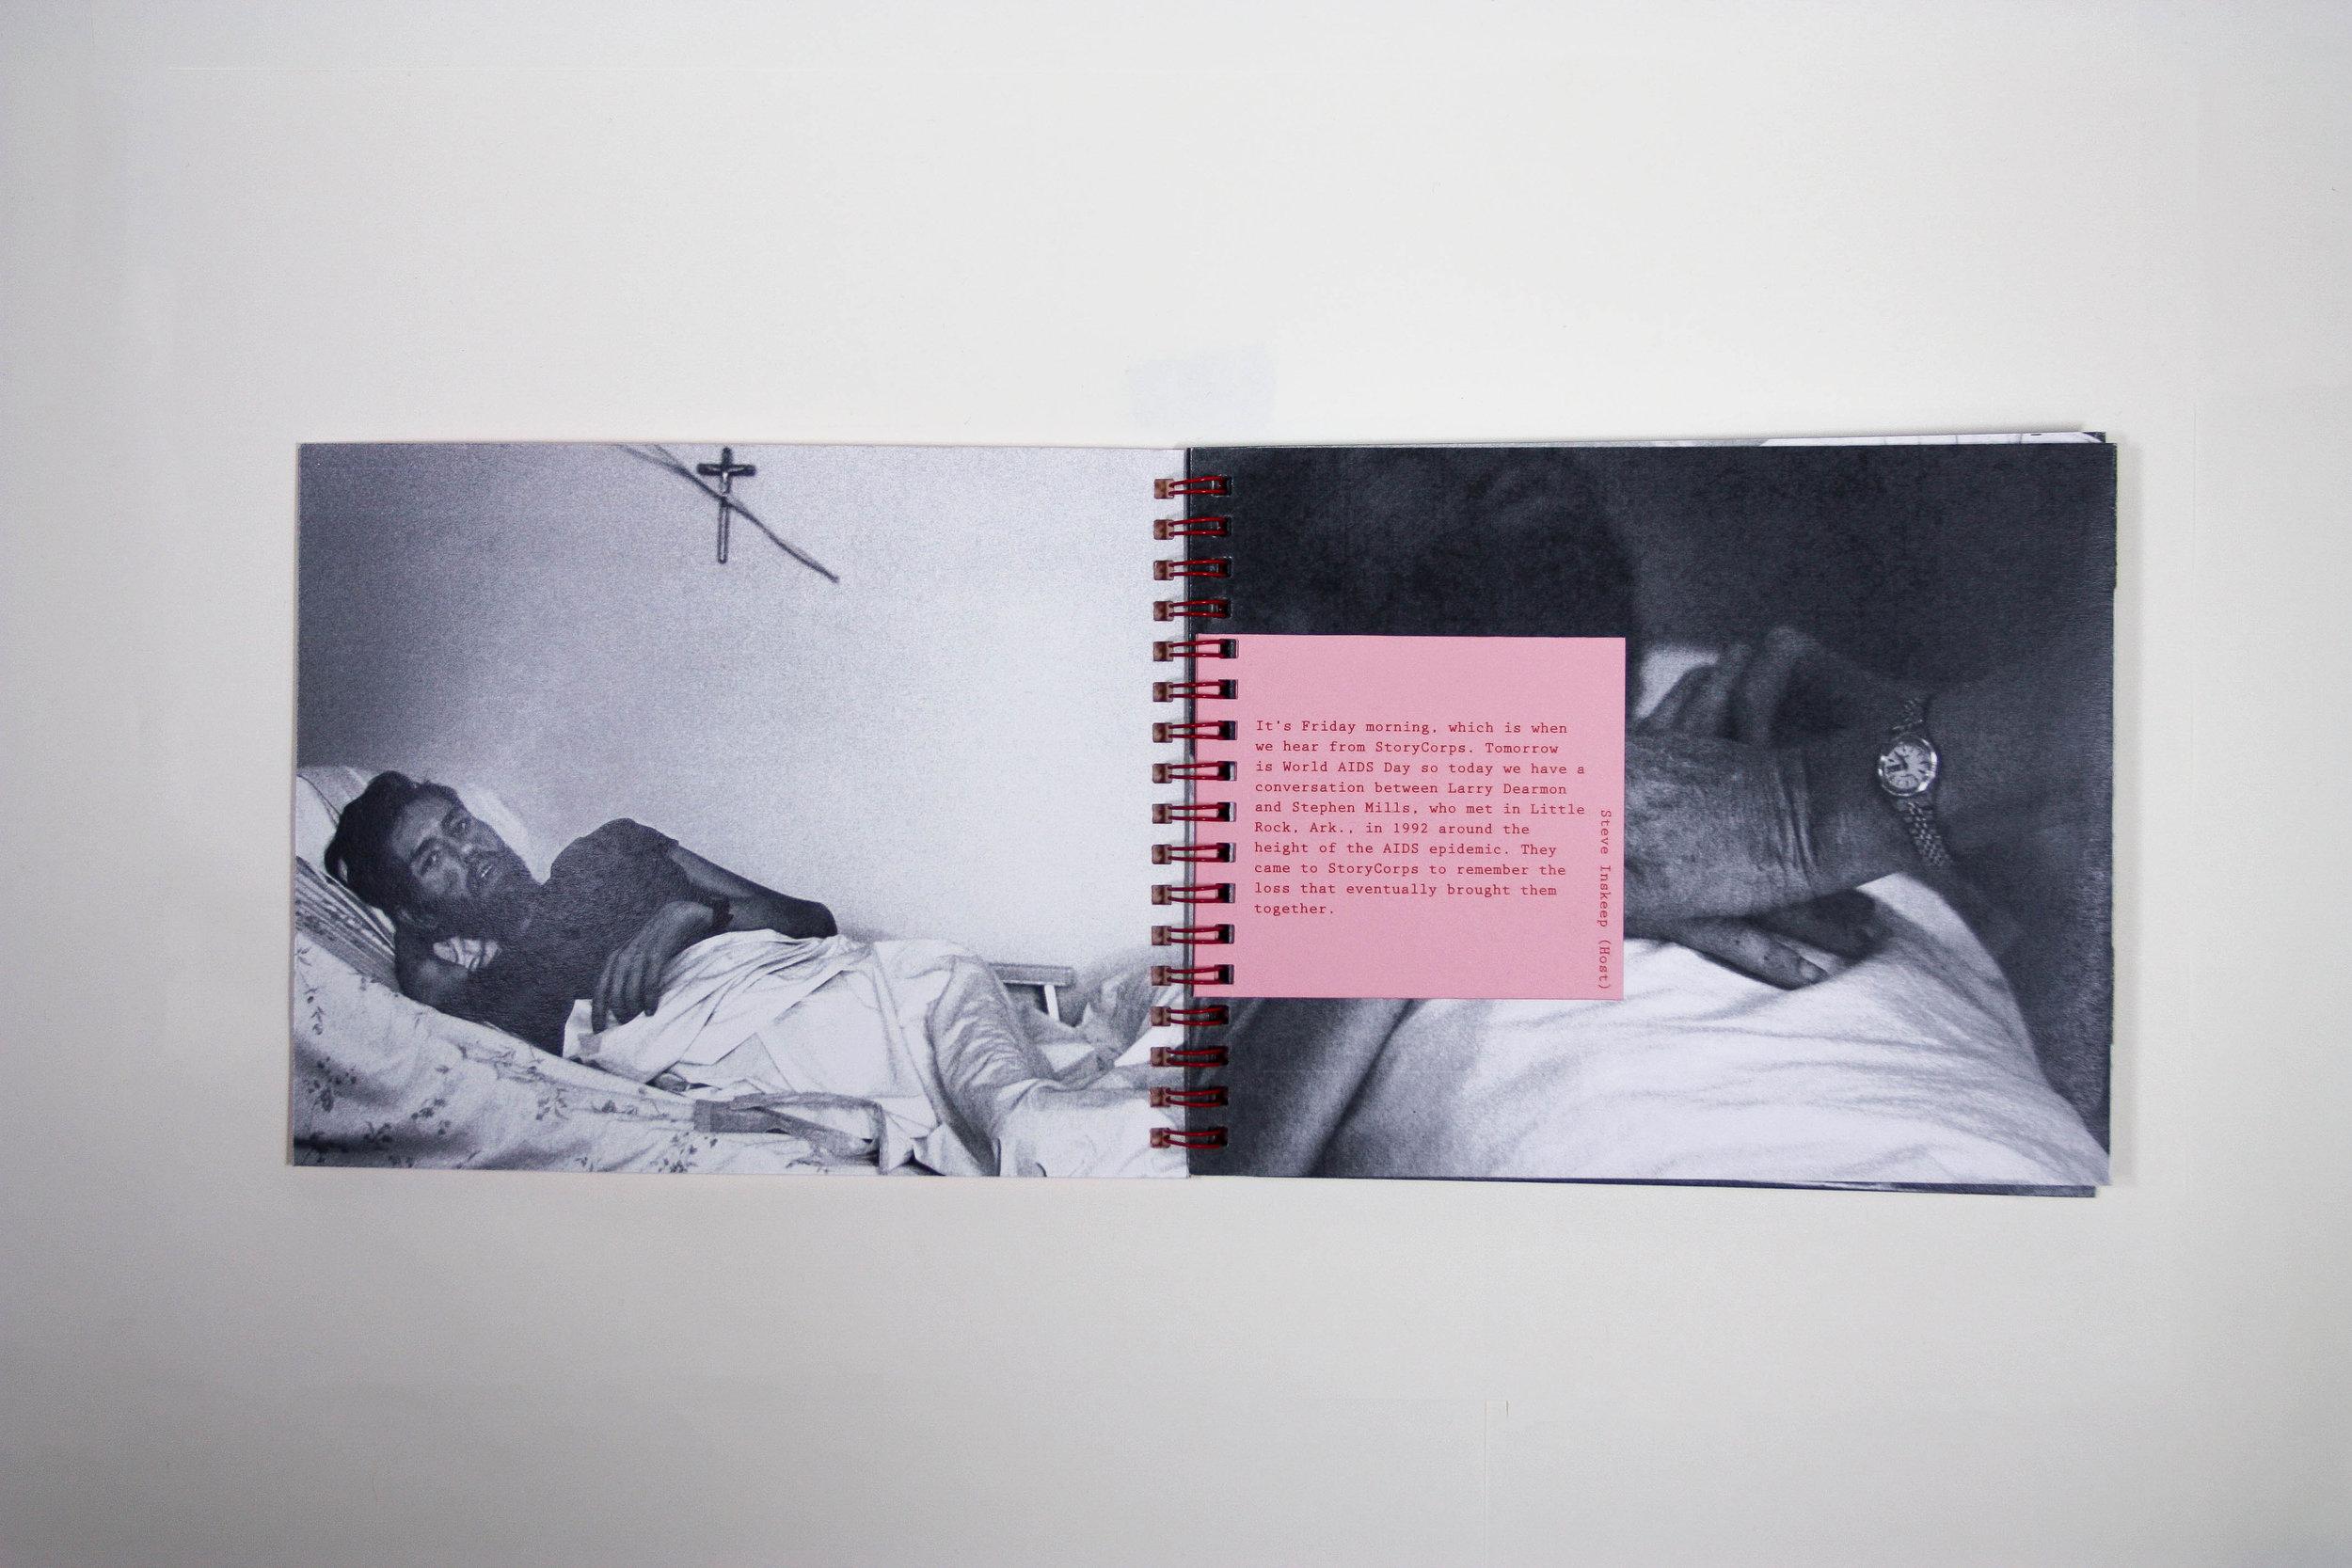 estory-bookimages-3.jpg